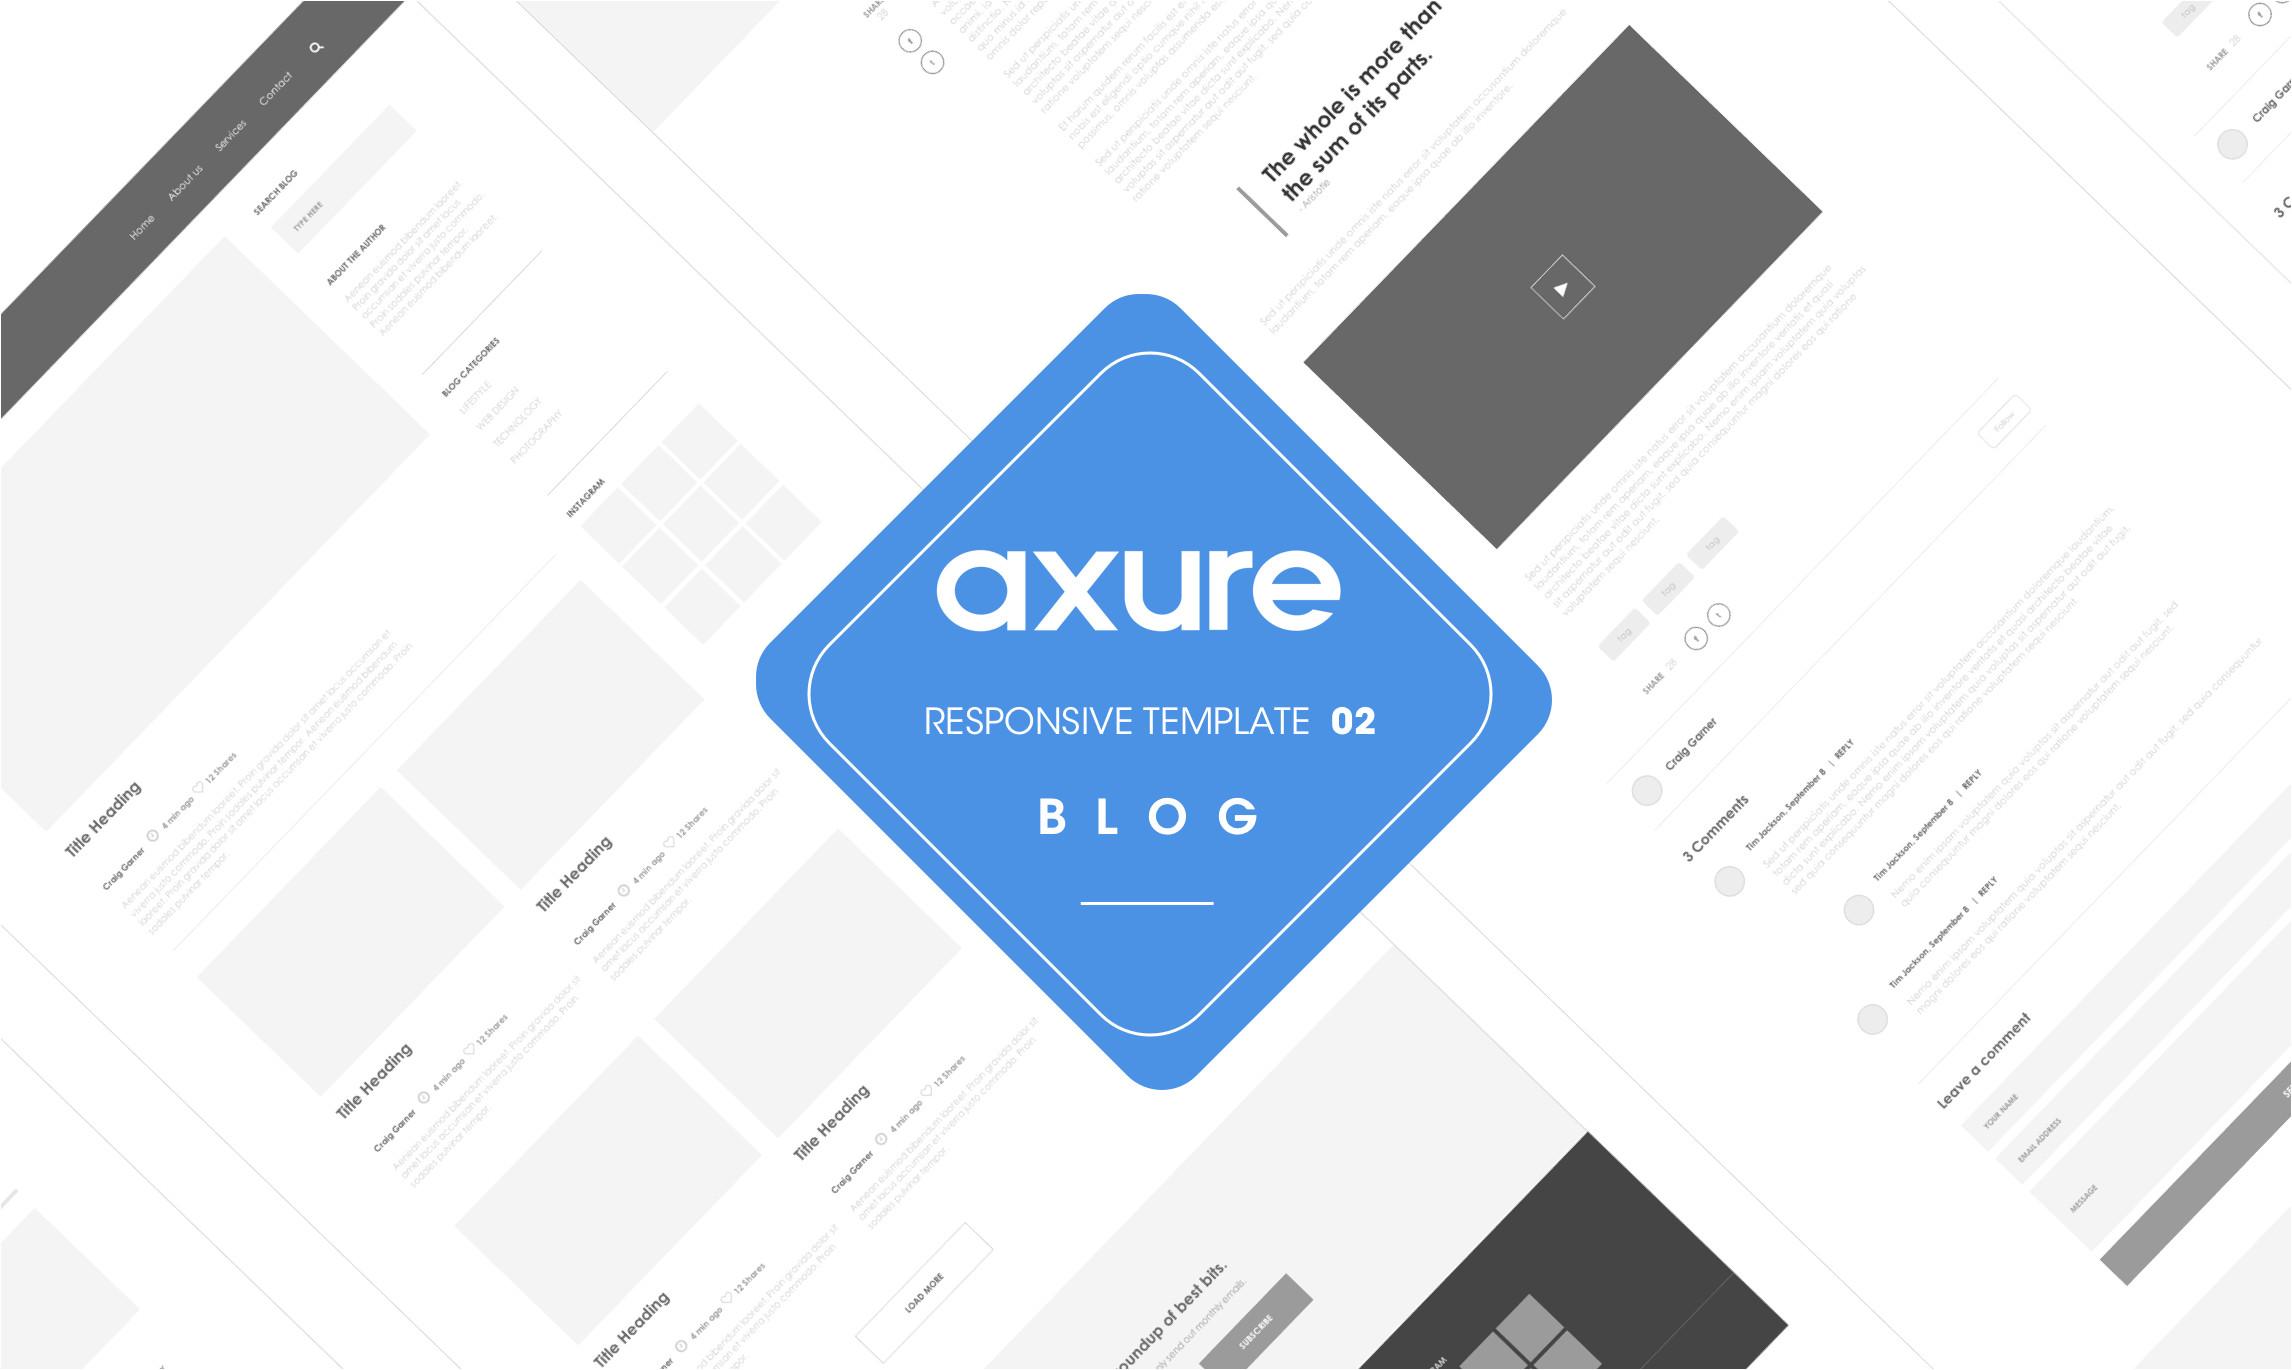 axure responsive template blog website 2